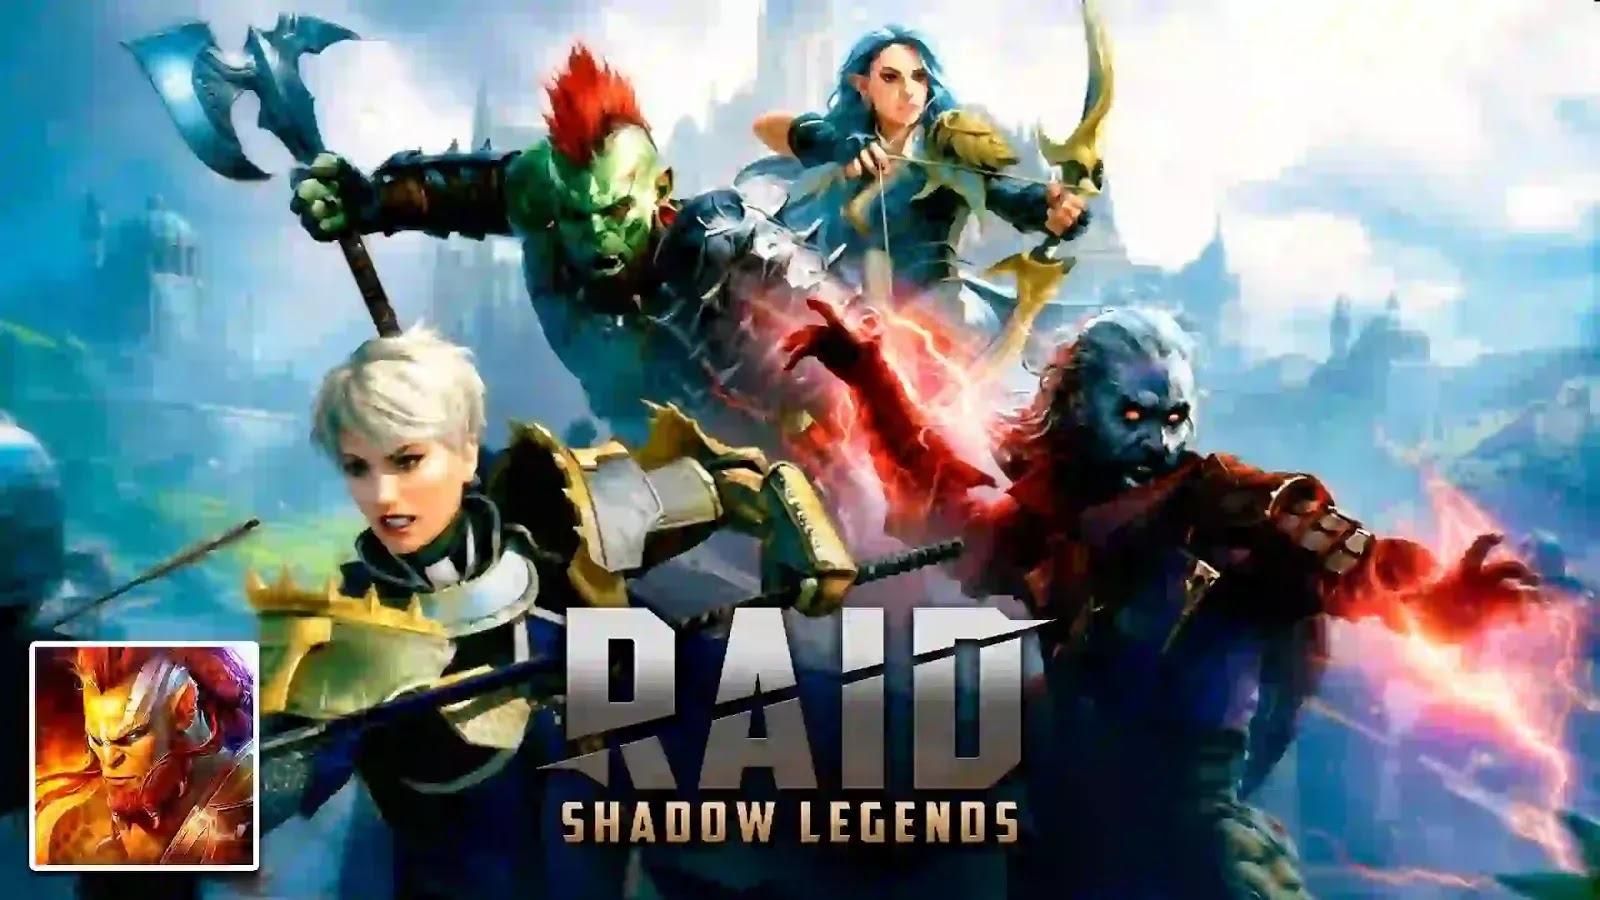 Raid: Shadow Legends هي لعبة تقمص أدوار على الكمبيوتر الشخصي والجوال تقع في عالم خيالي.